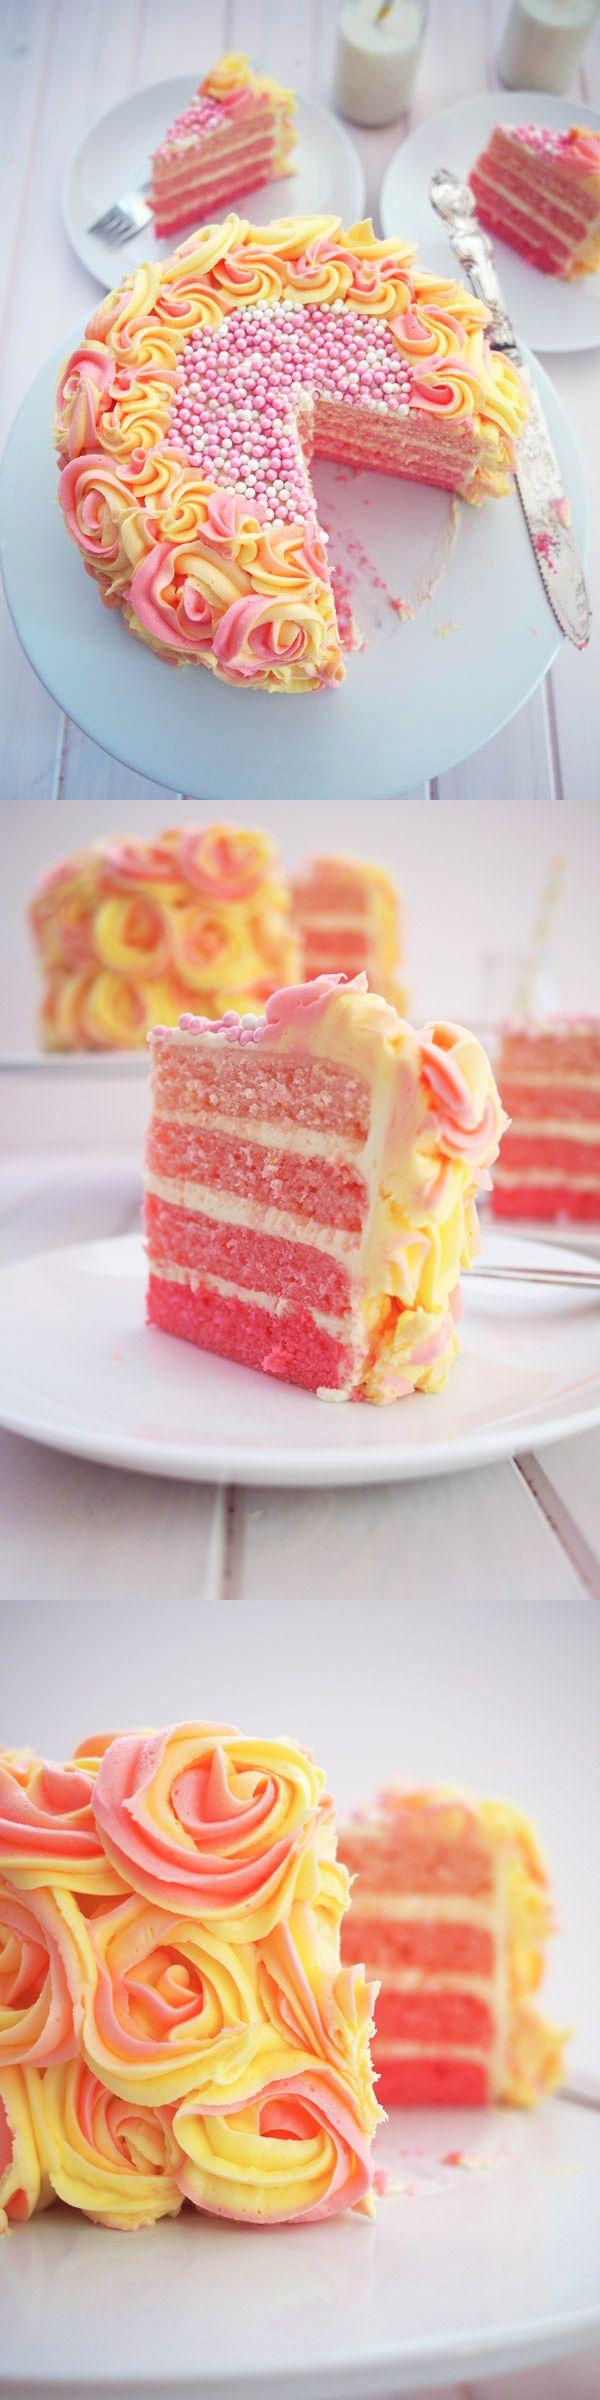 Pink Rainbow Lemonade Cake